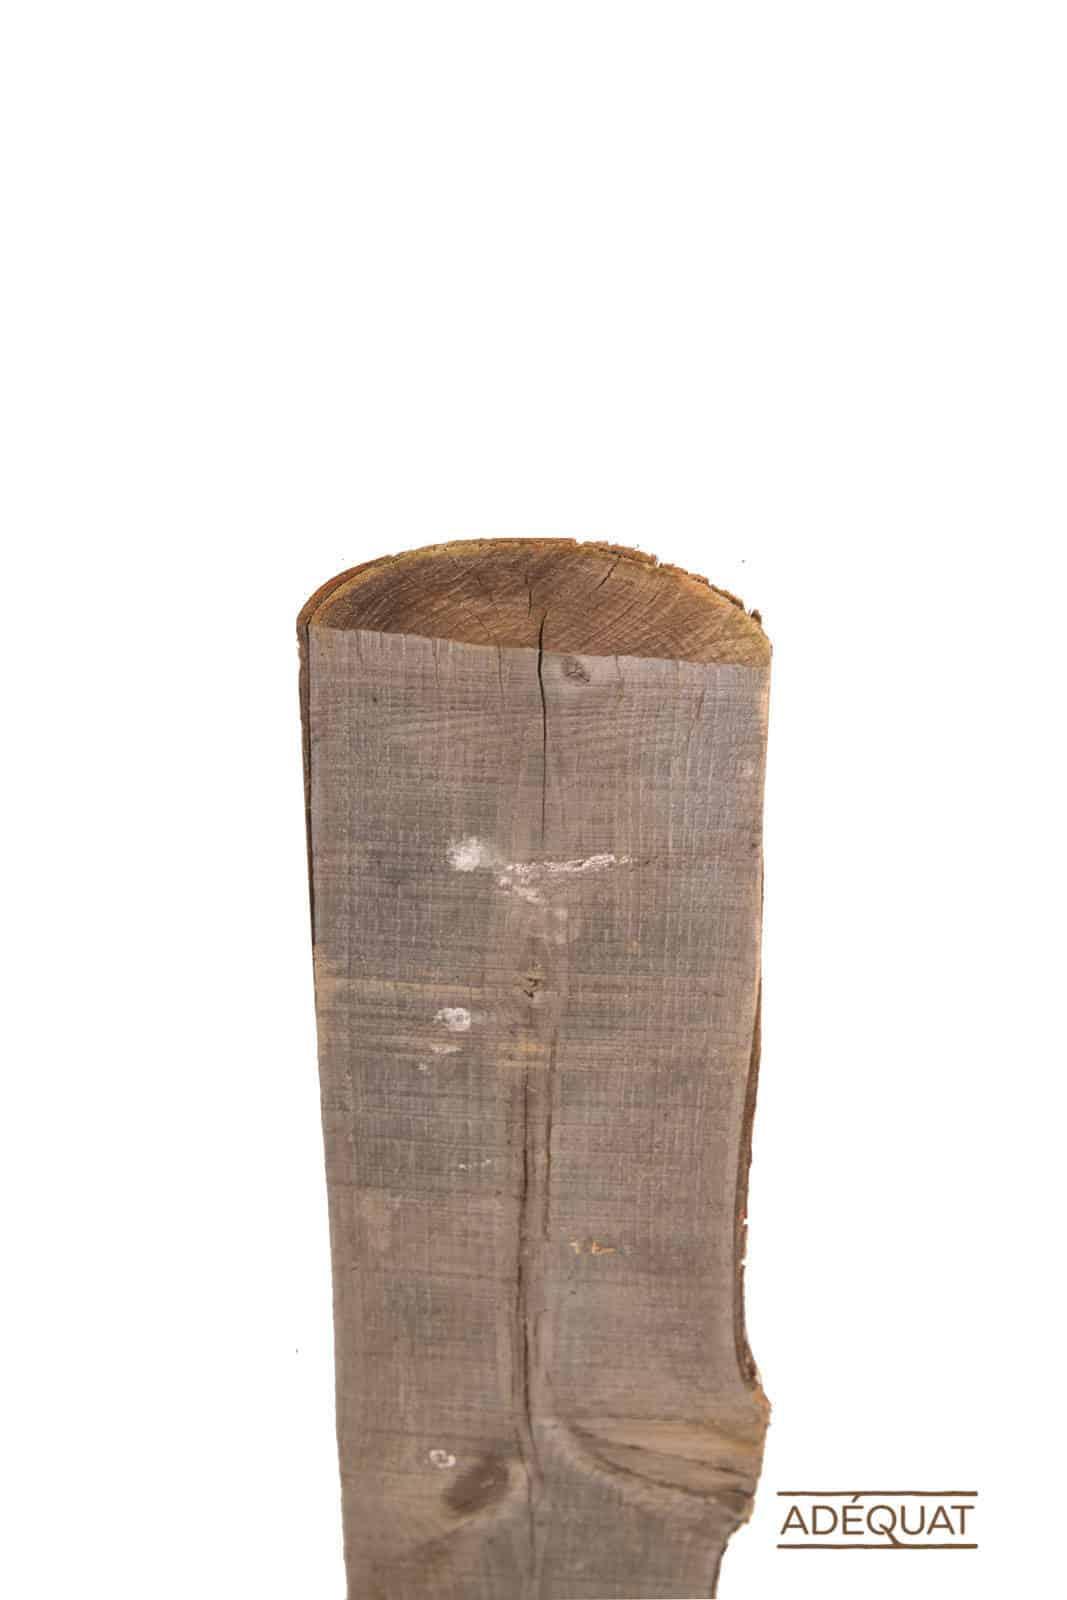 halfronde kastanjehouten paal